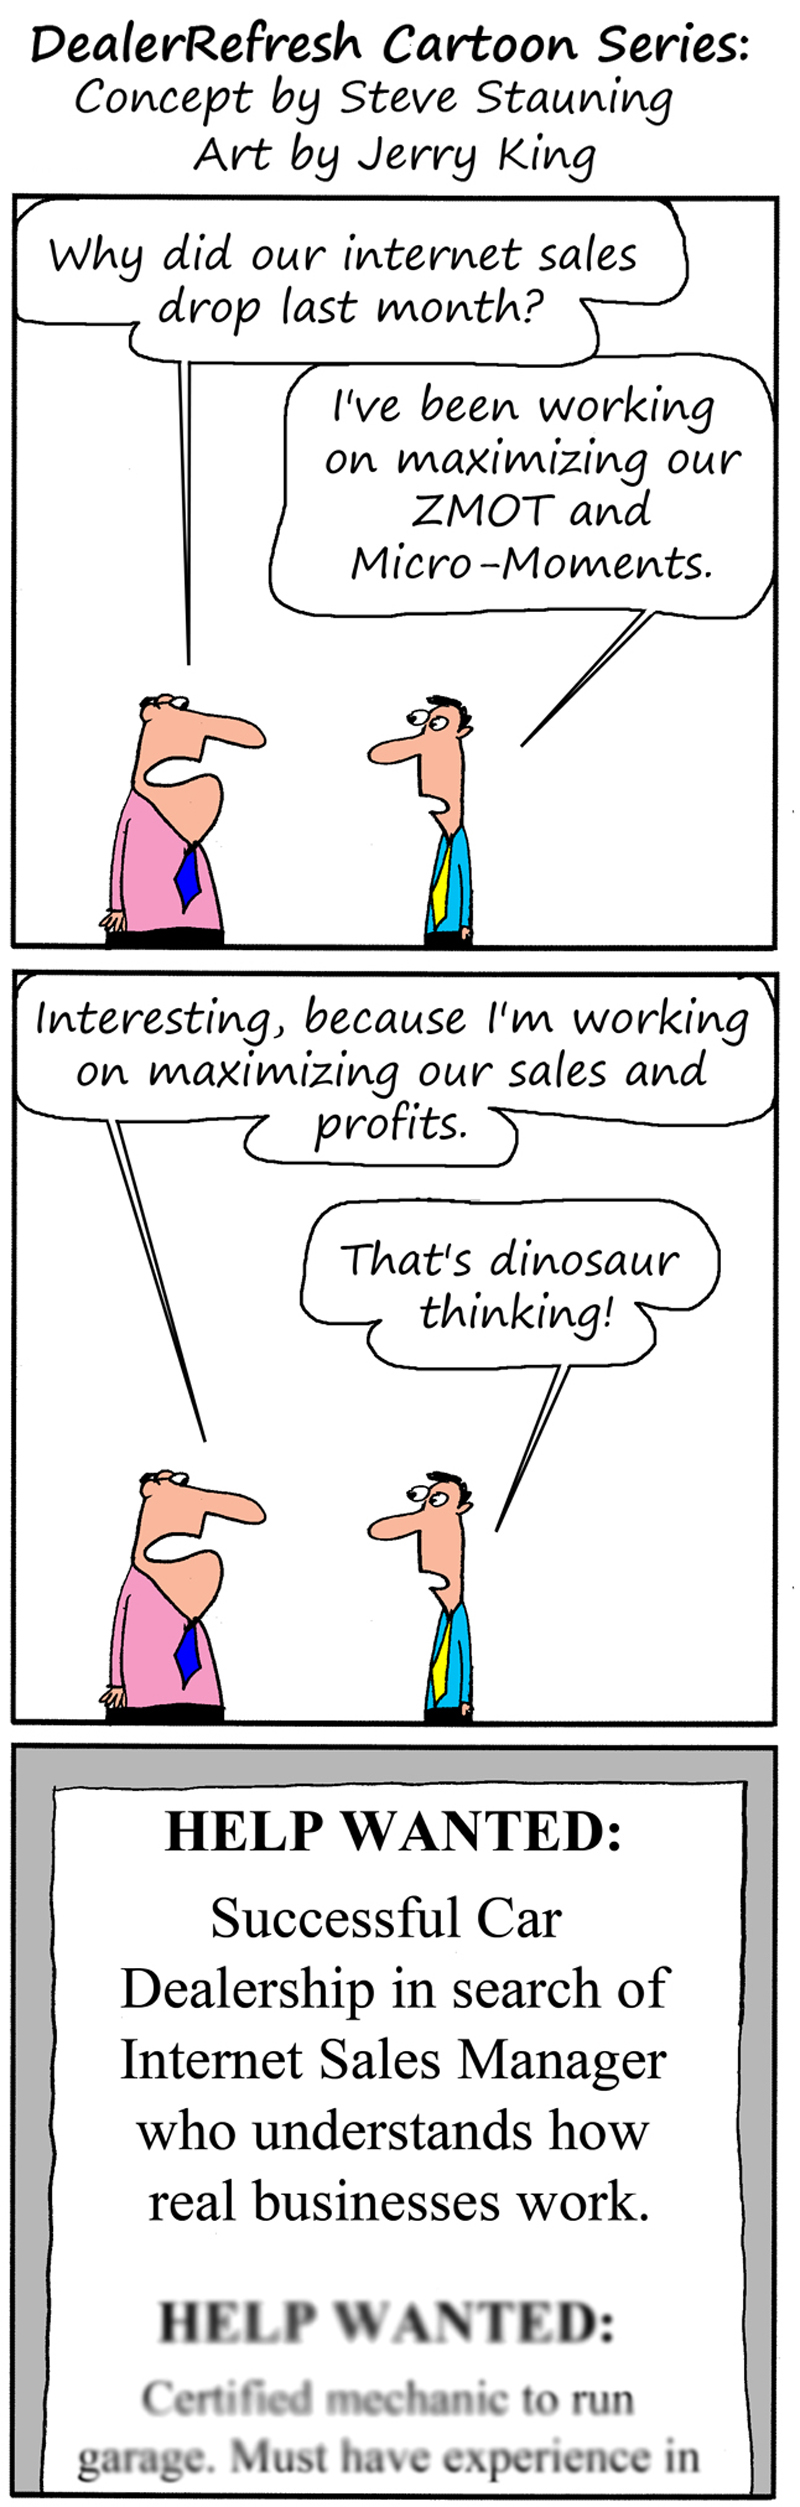 Internet Sales Drop DealerRefresh CartoonSeries